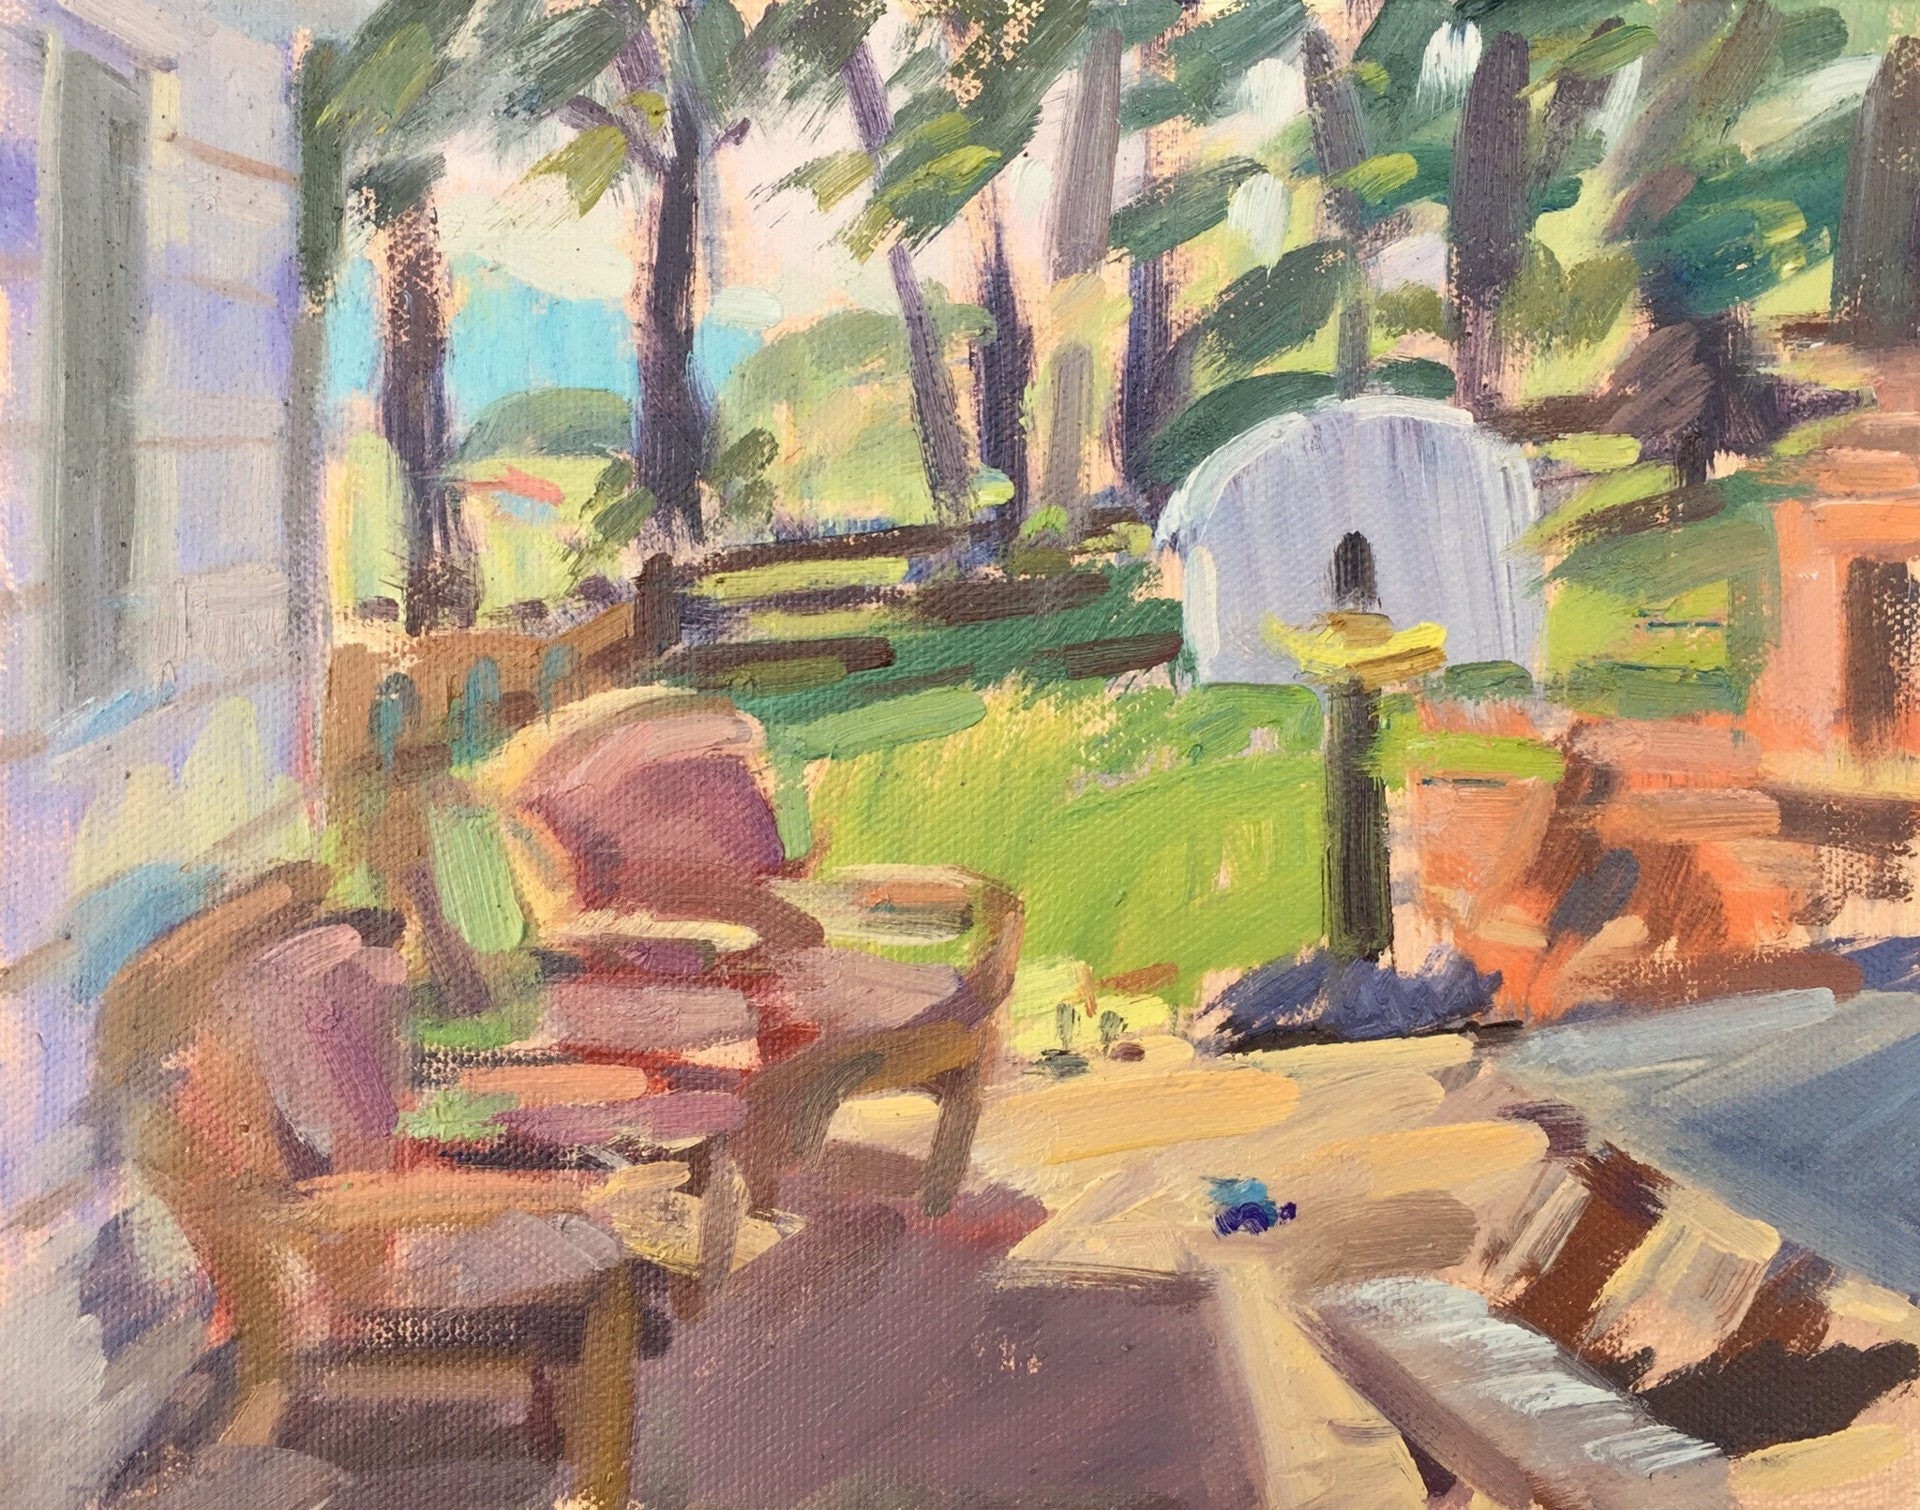 Summer Patio (study) by James Erickson